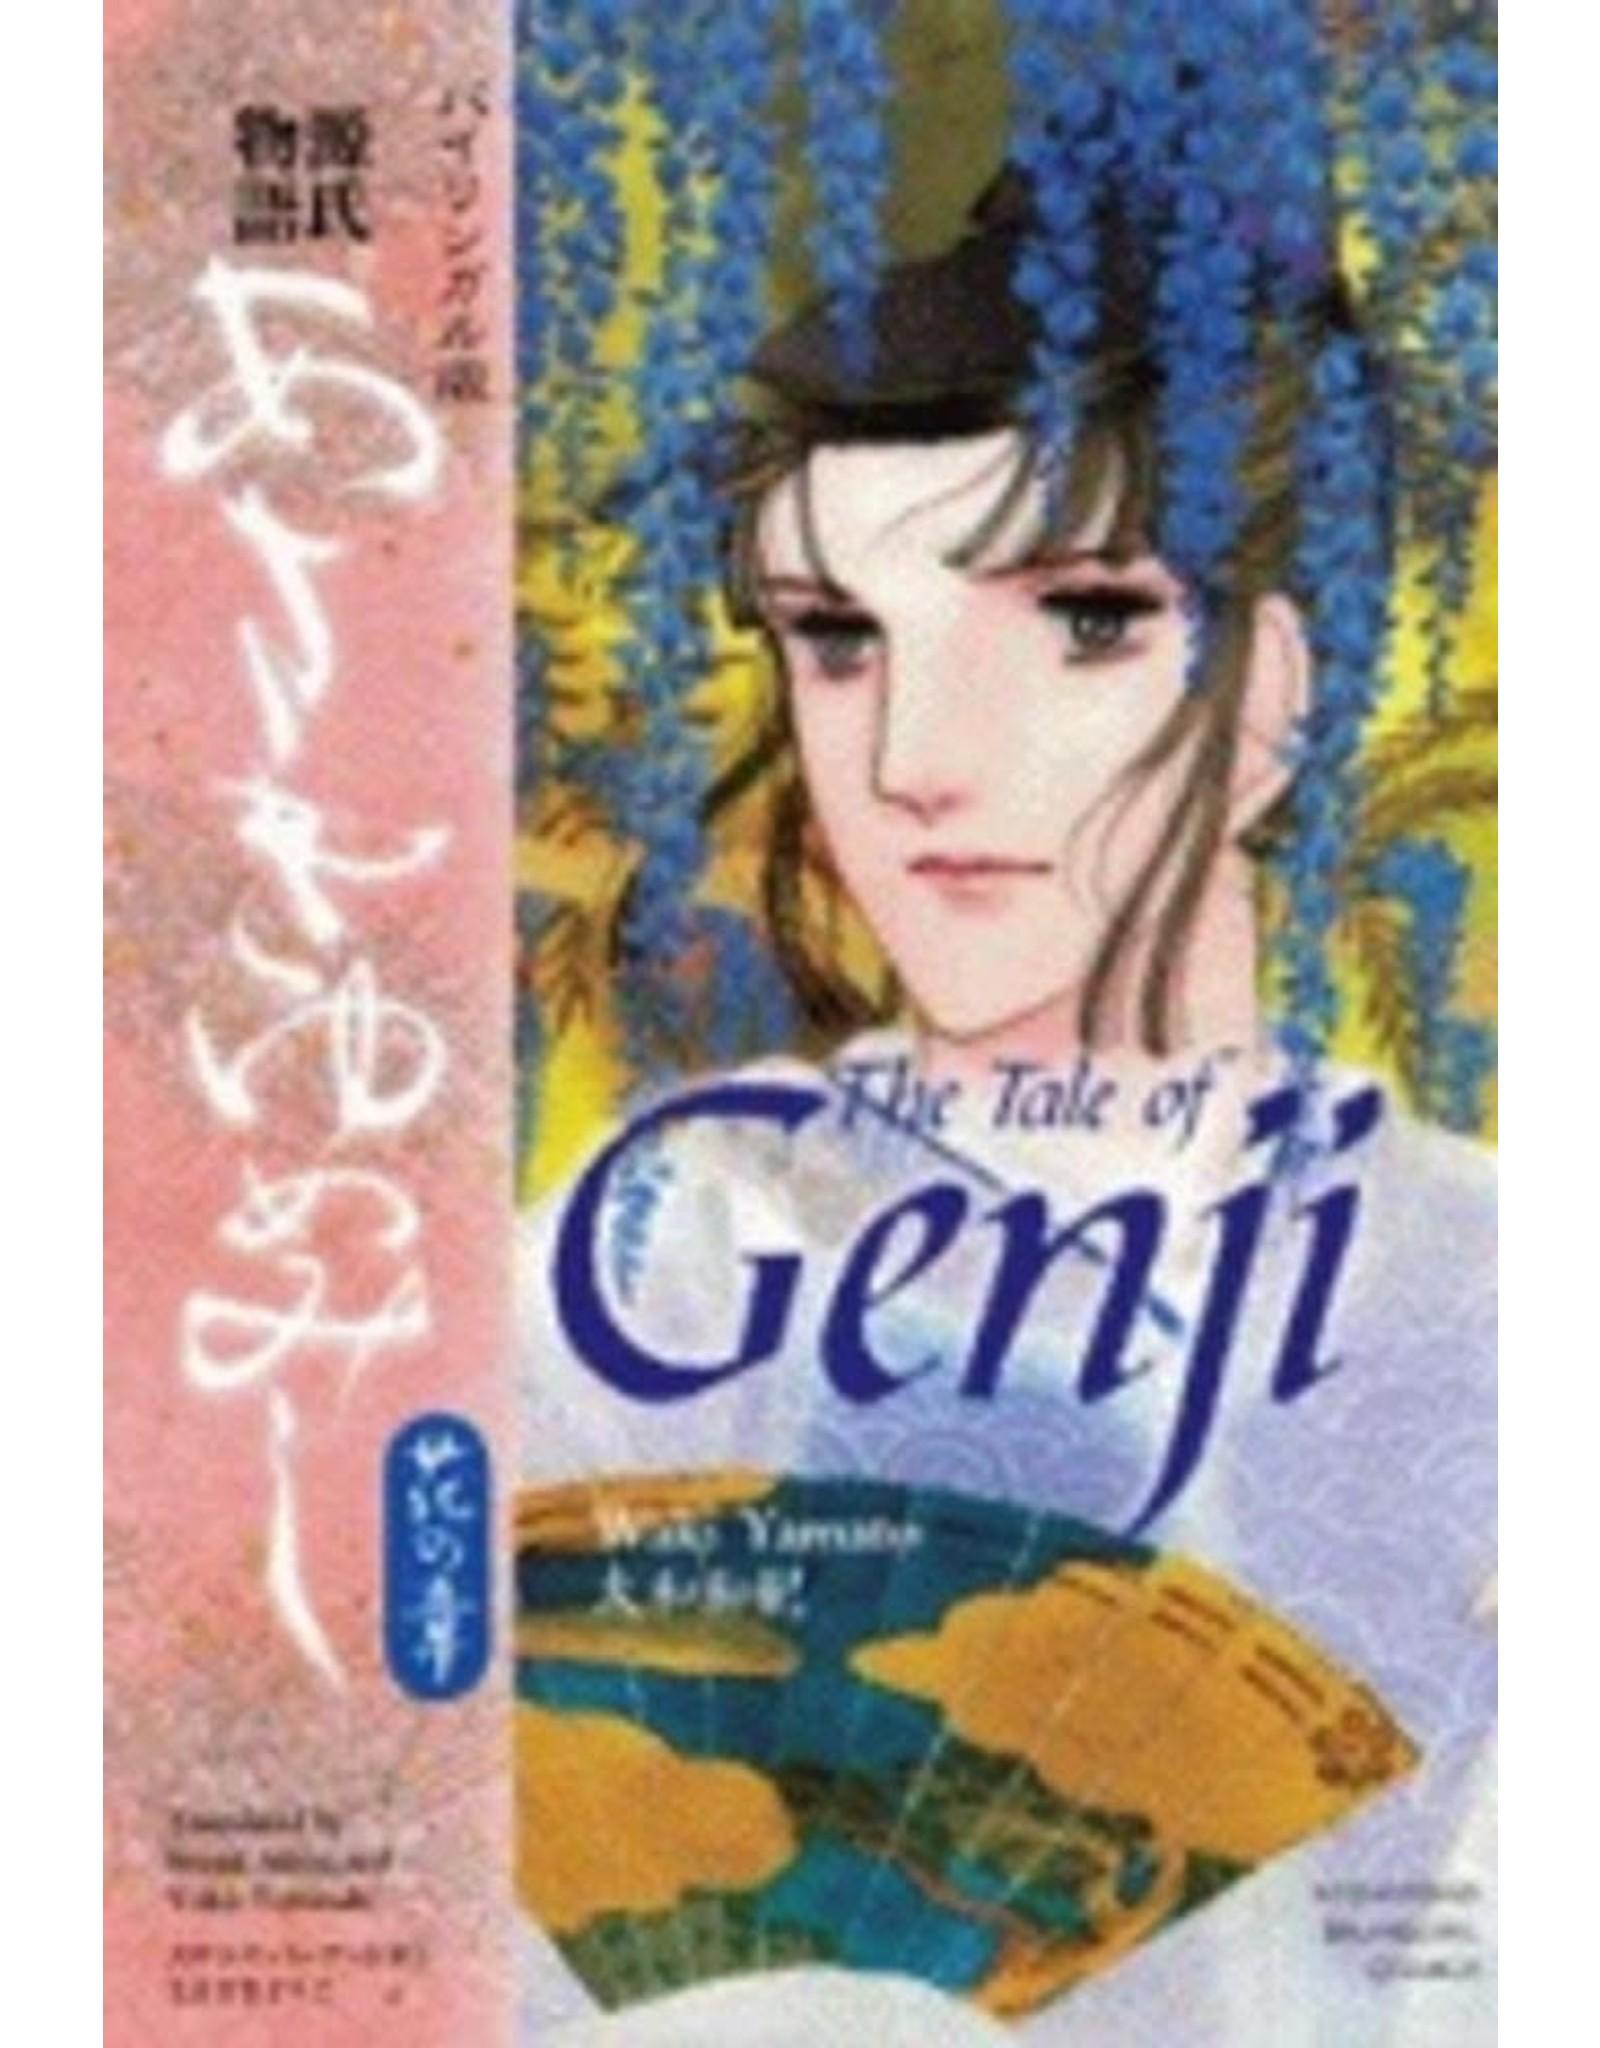 KODANSHA INTERNATIONAL [BILINGUAL]  ASAKI YUMEMISHI: THE TALE OF GENJI CHAPTER OF FLOWER